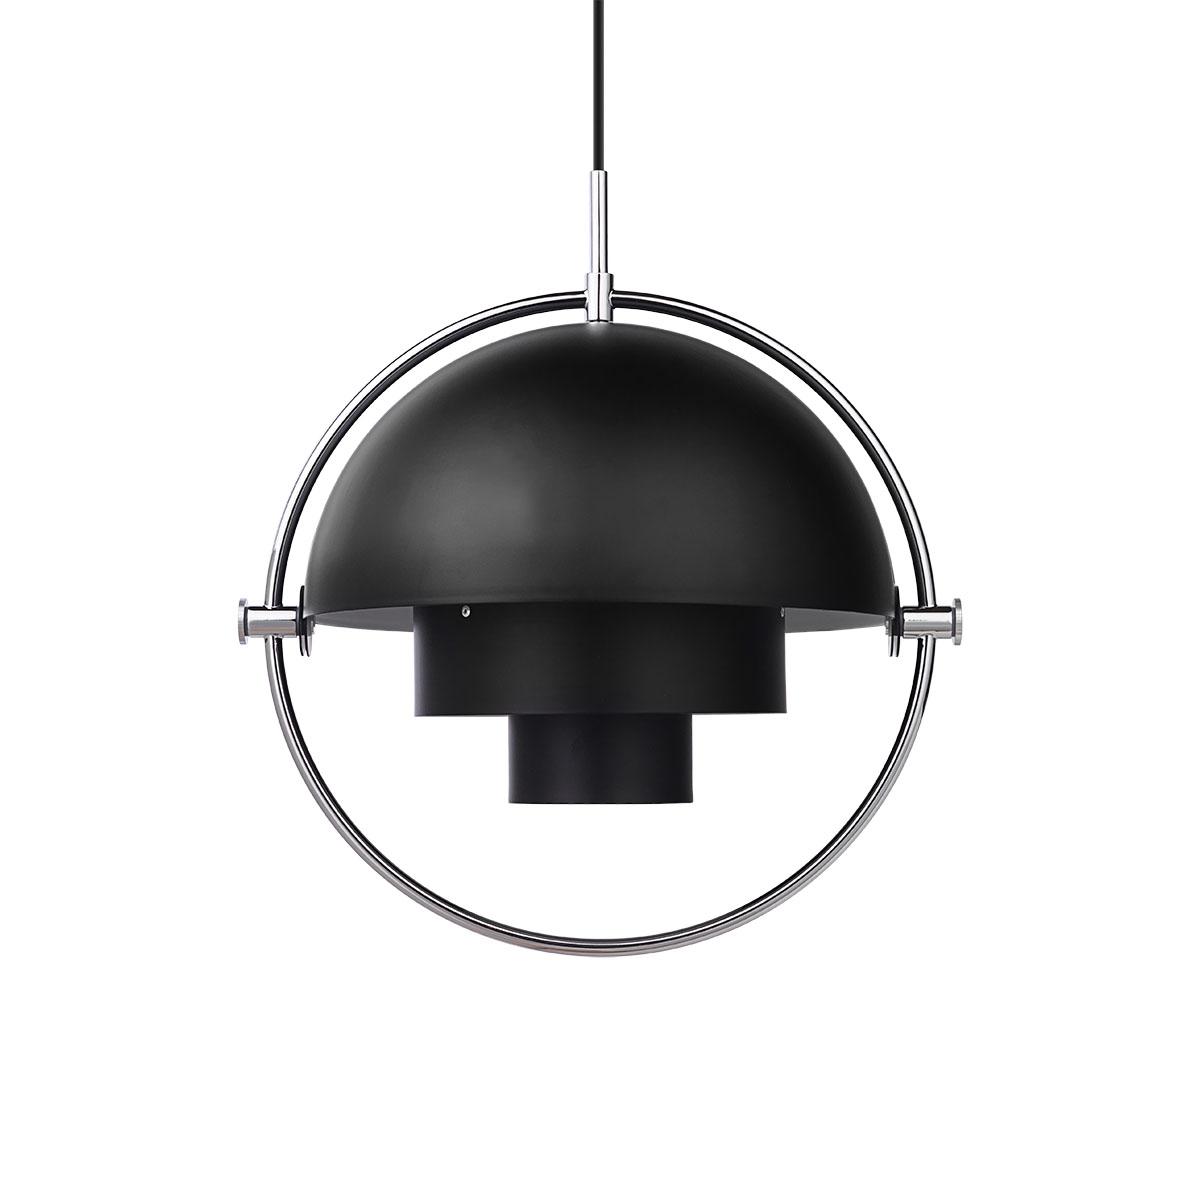 Multi-Lite Taklampe Sort/Krom